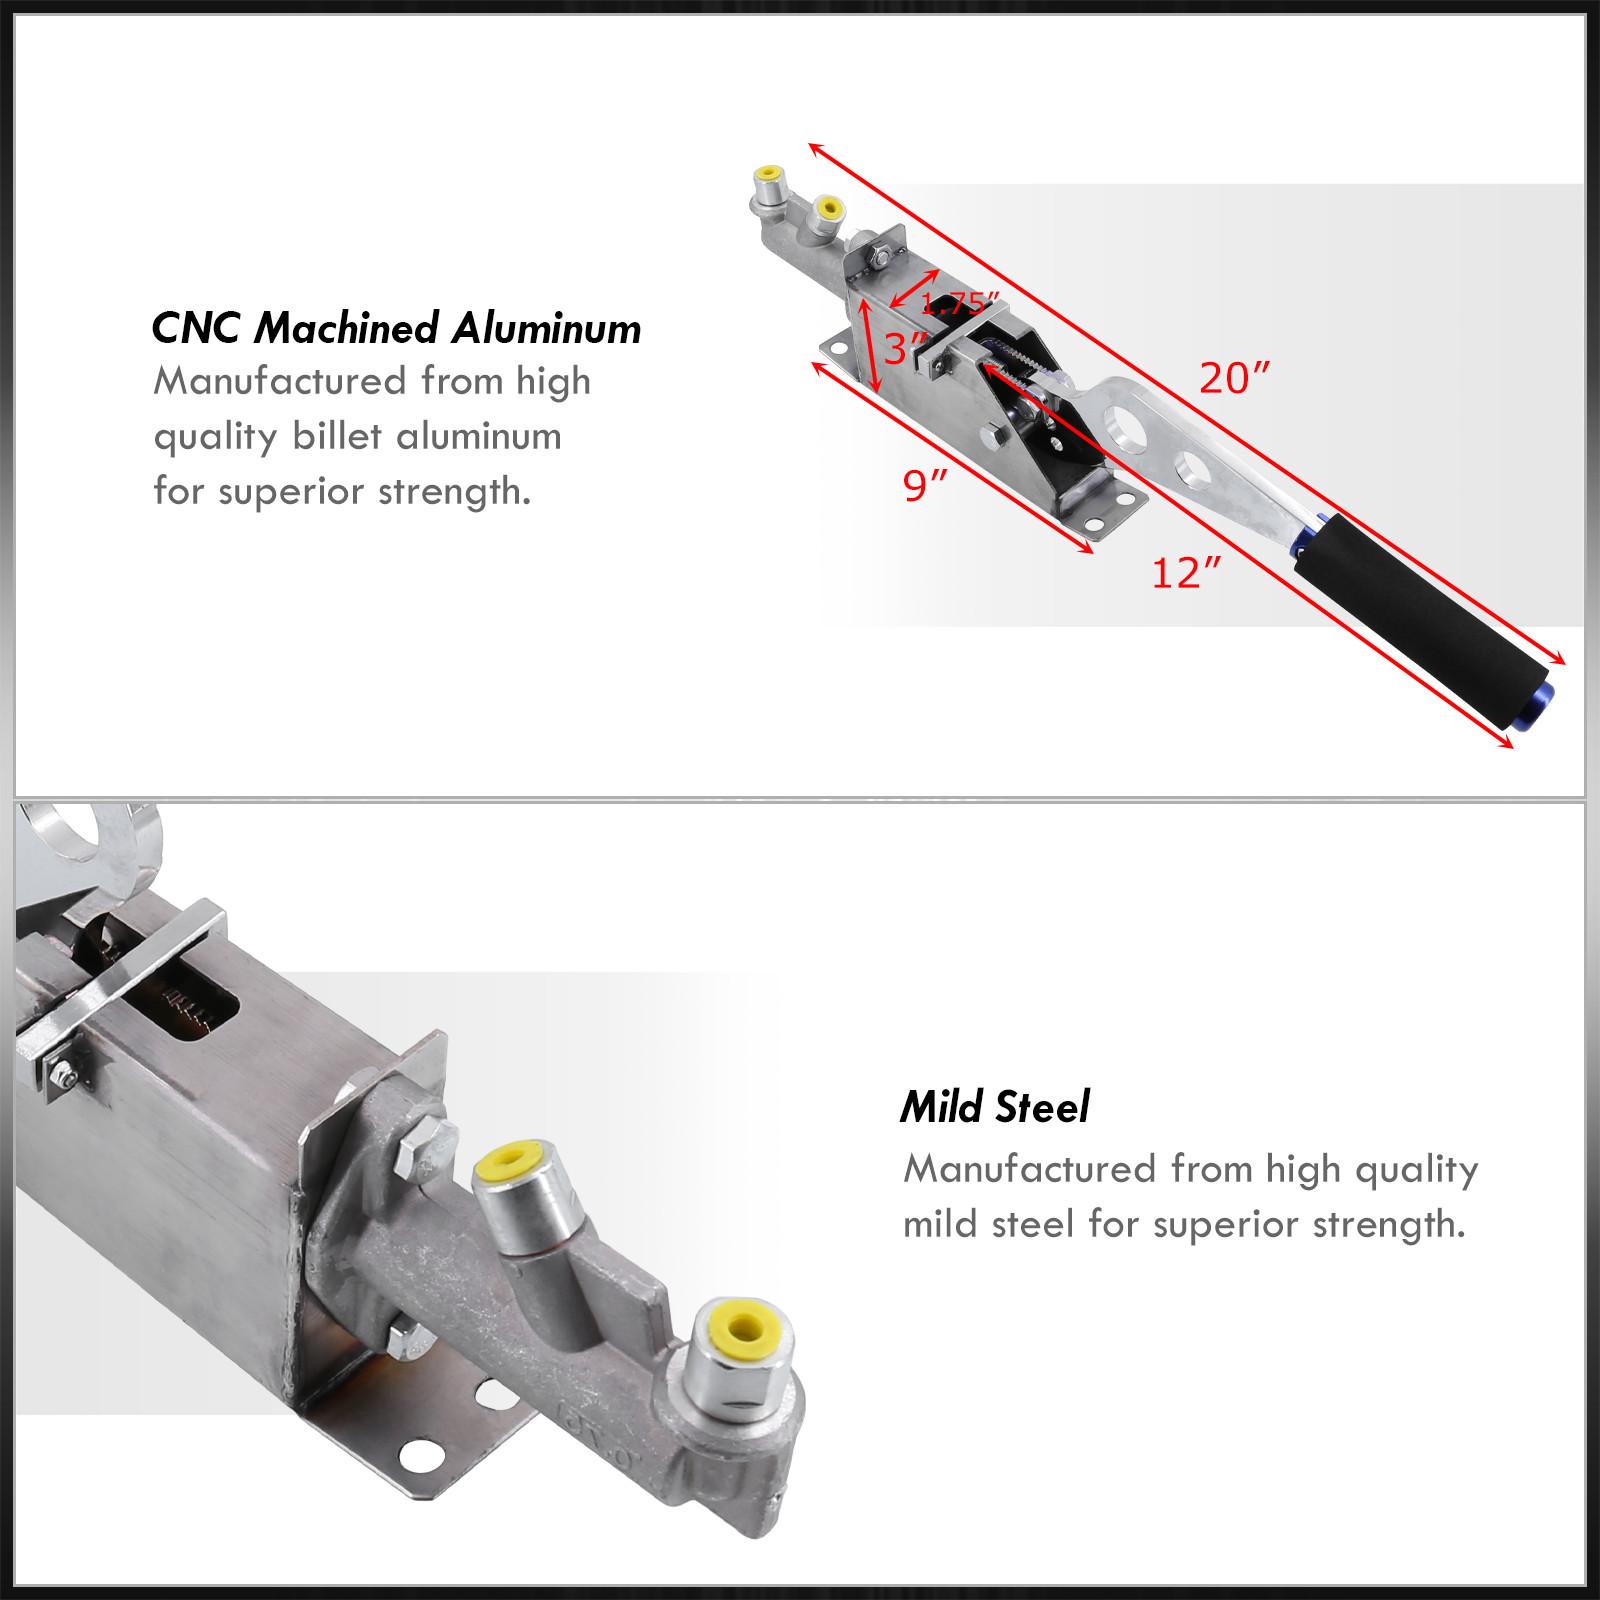 Hydraulic Lever Lock Brake Control : Racing hydraulic handbrake ebrake parking emergency brake